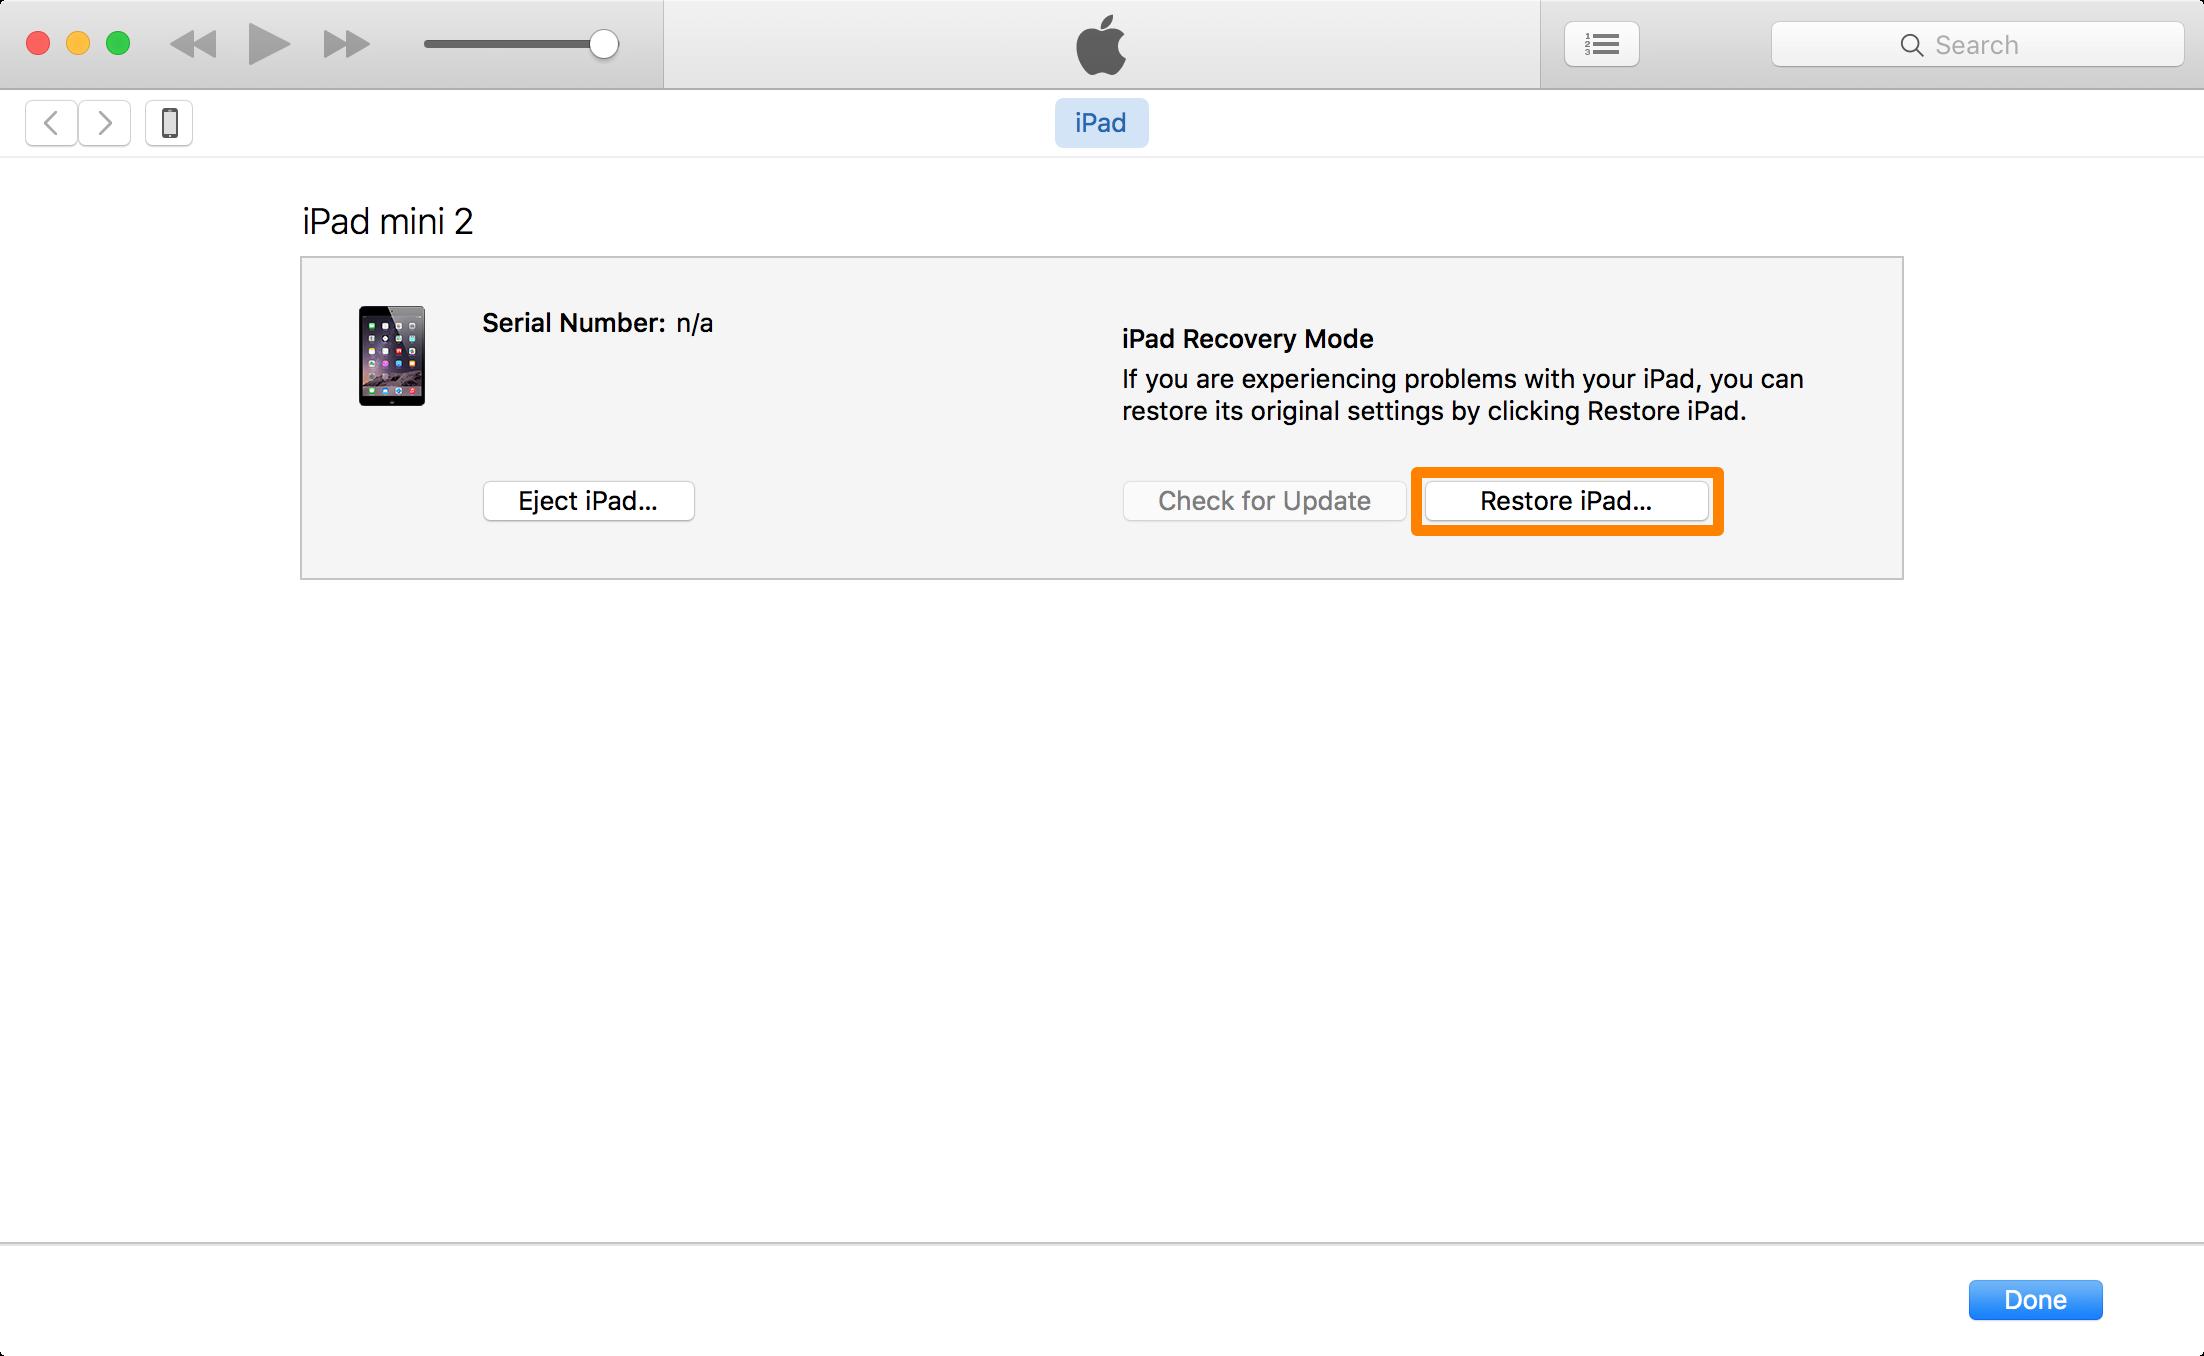 Restore iPad Prompt iTunes